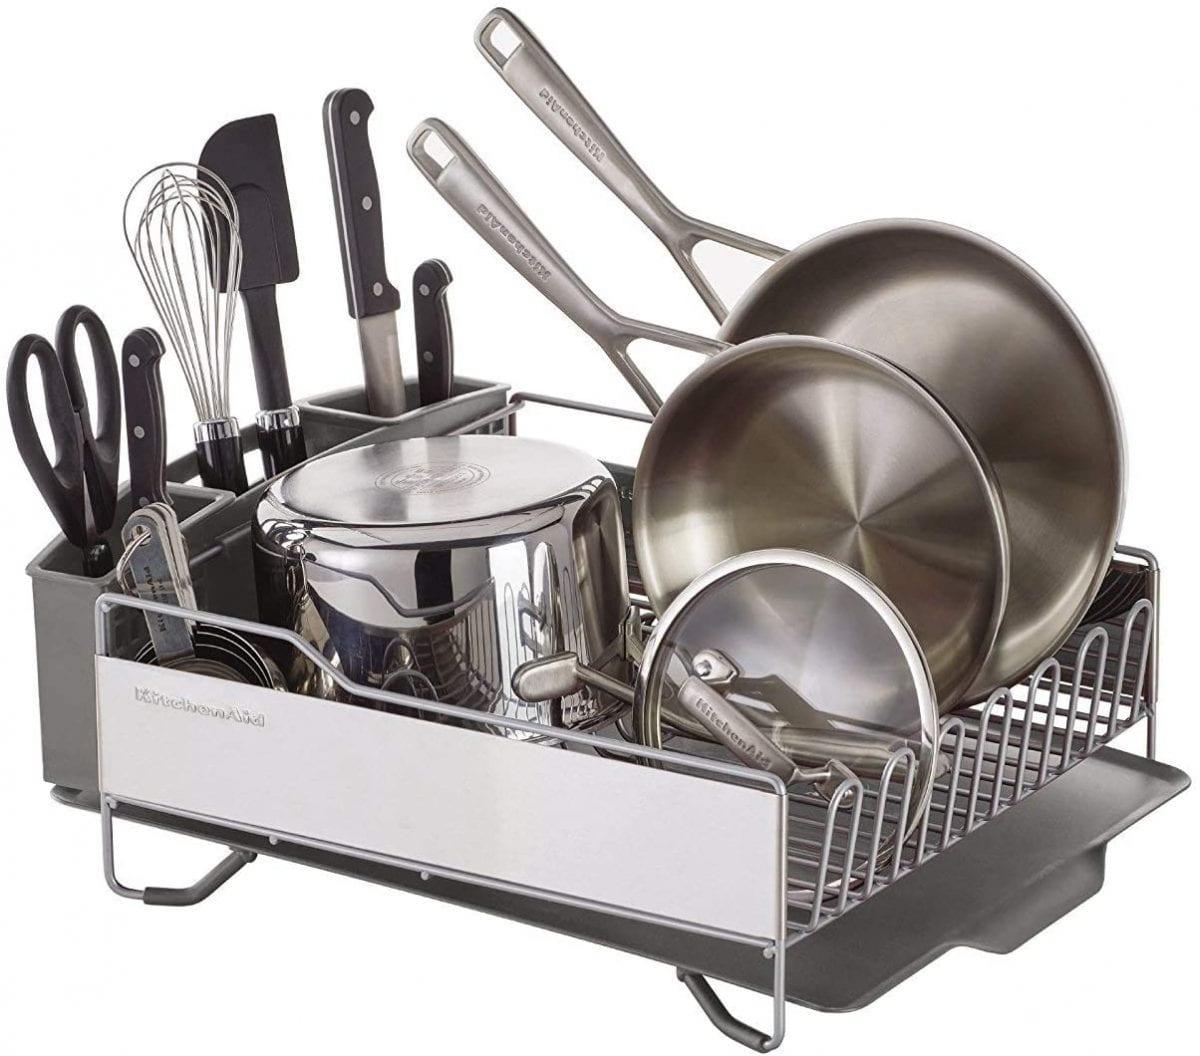 KitchenAid counter dish rack